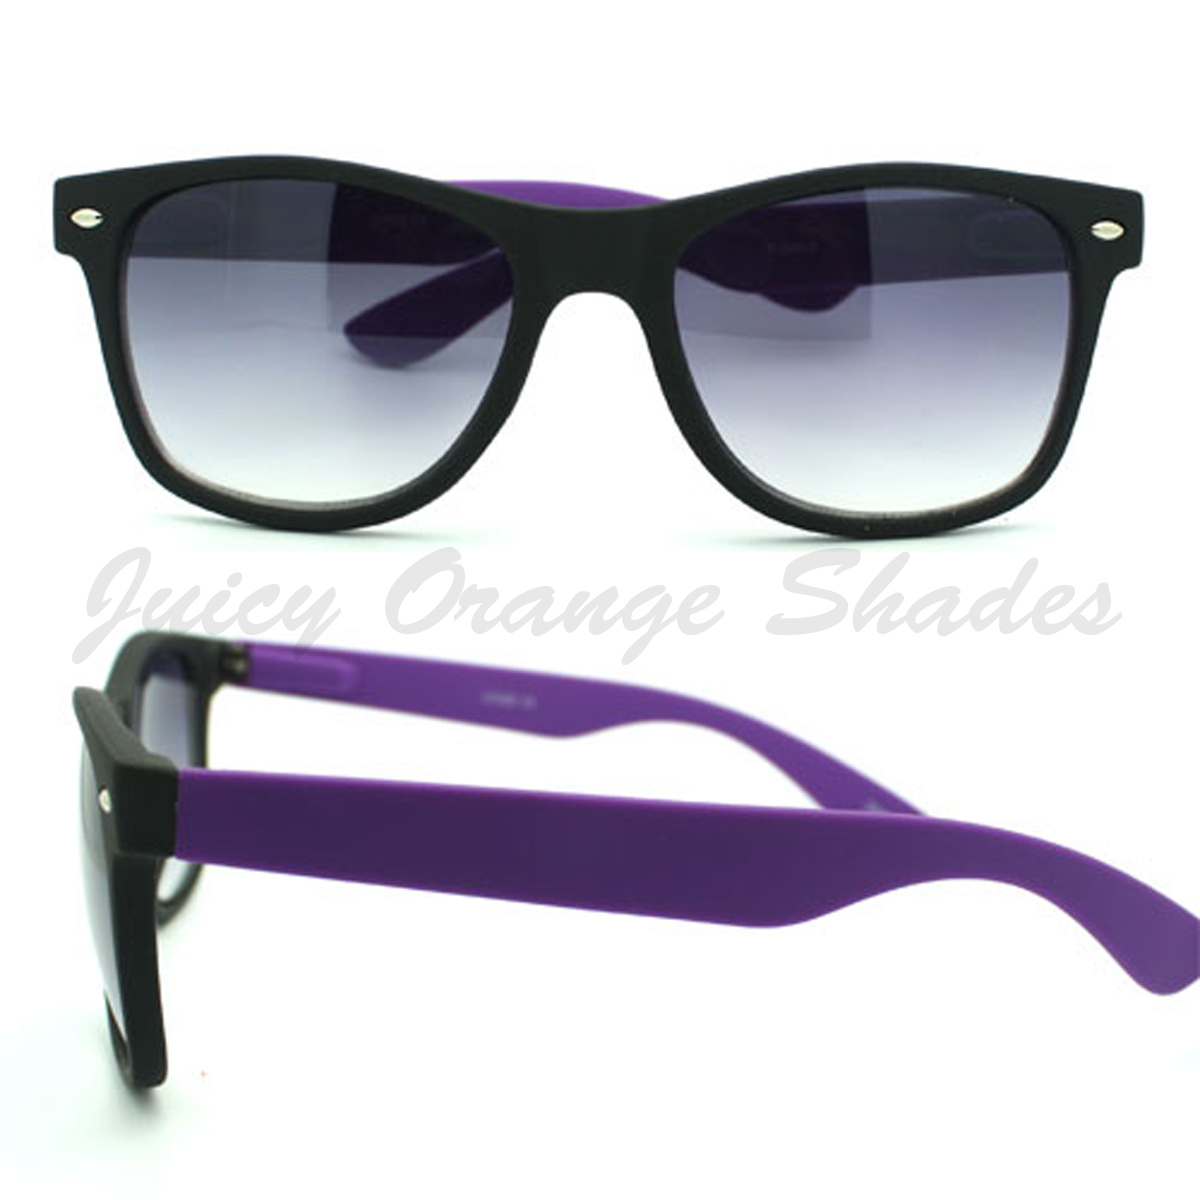 2-TONE Horn Rimmed UNISEX Sunglasses More BRIGHT FUN Colors SOFT MATTE Finish